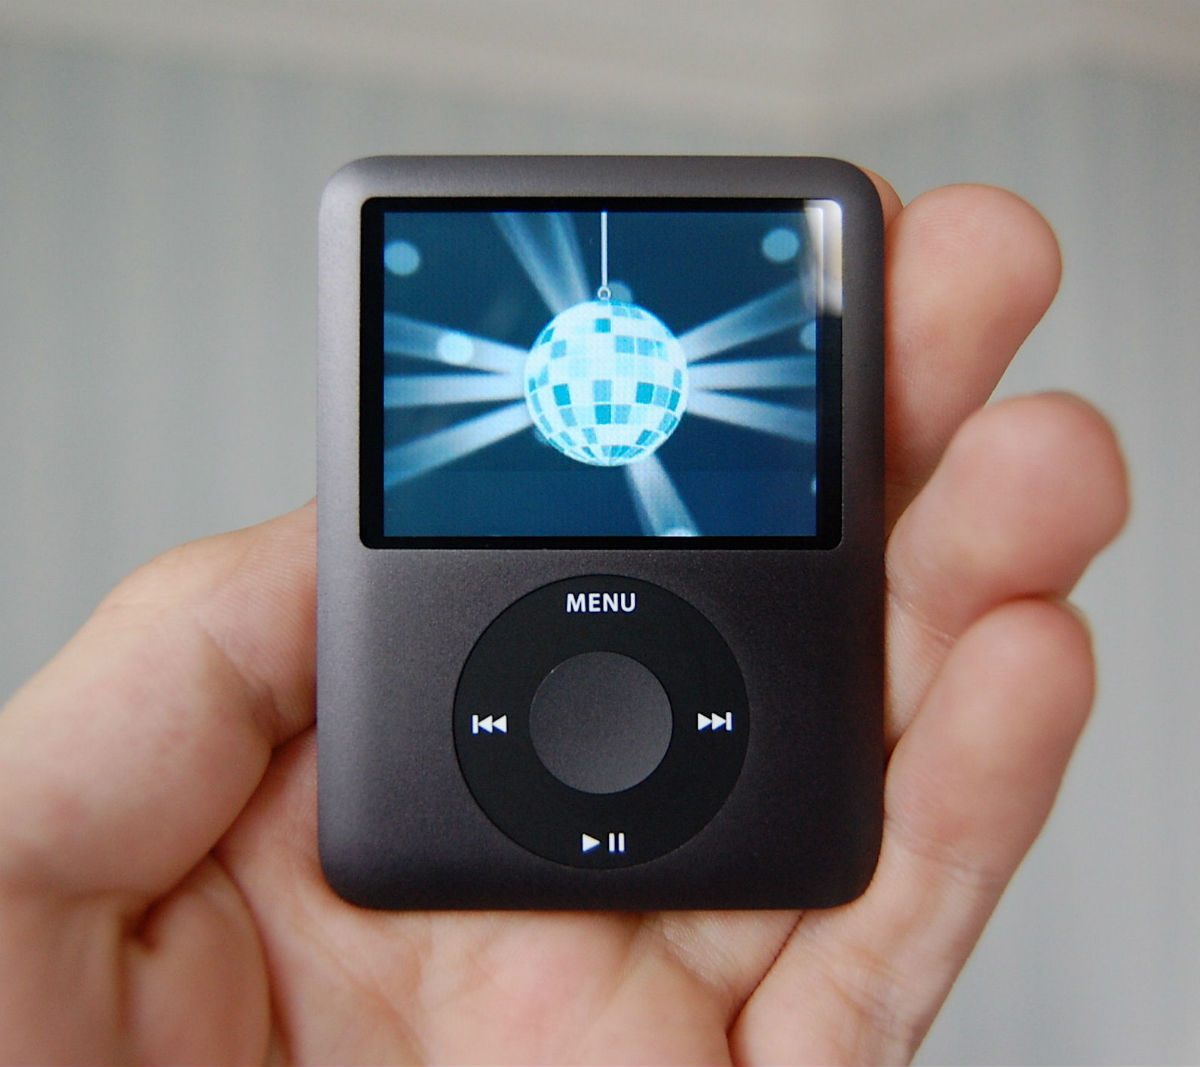 Ipod Nano en la mano